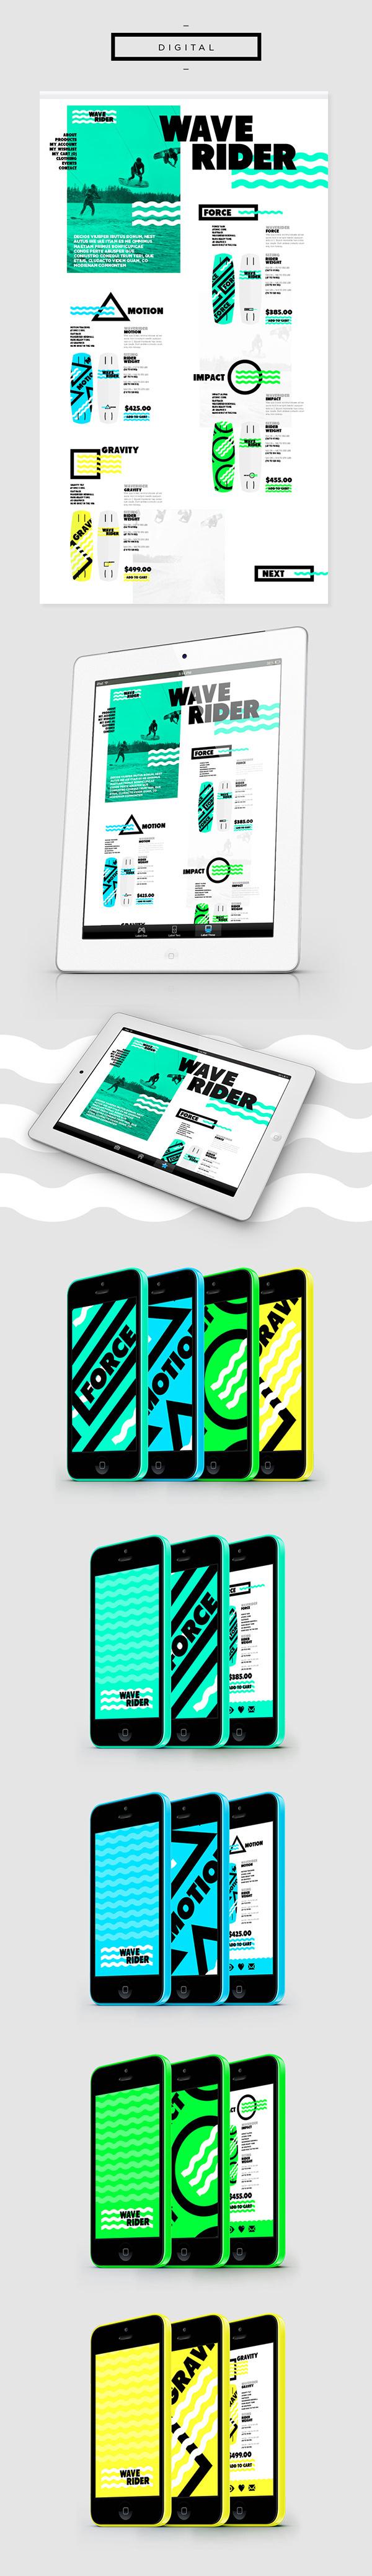 WAVERIDER // Branding on Behance #water #branding #black #shape #identity #sea #logo #green